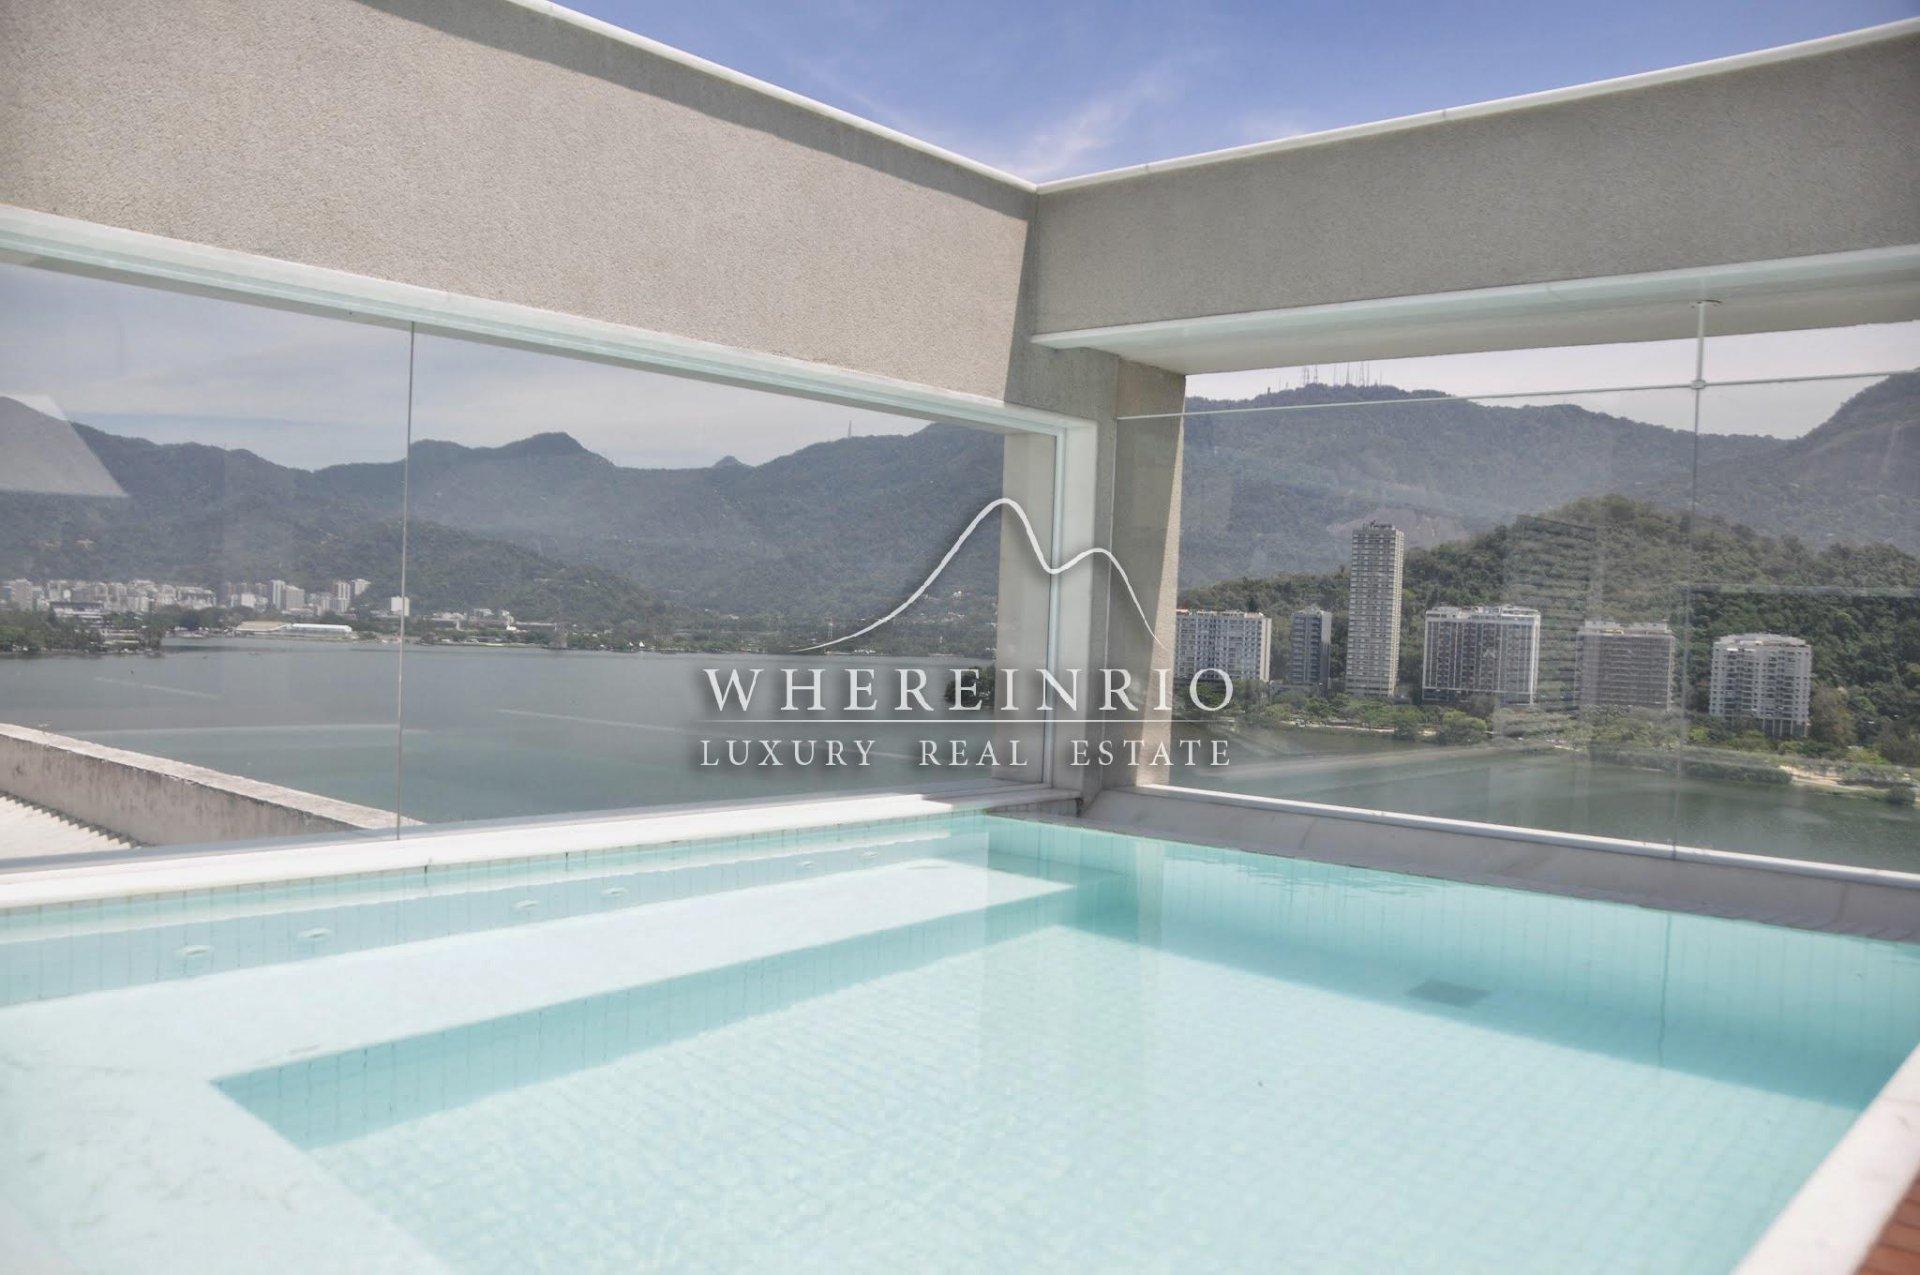 Wohnung in Ipanema, Rio de Janeiro, Brasilien 1